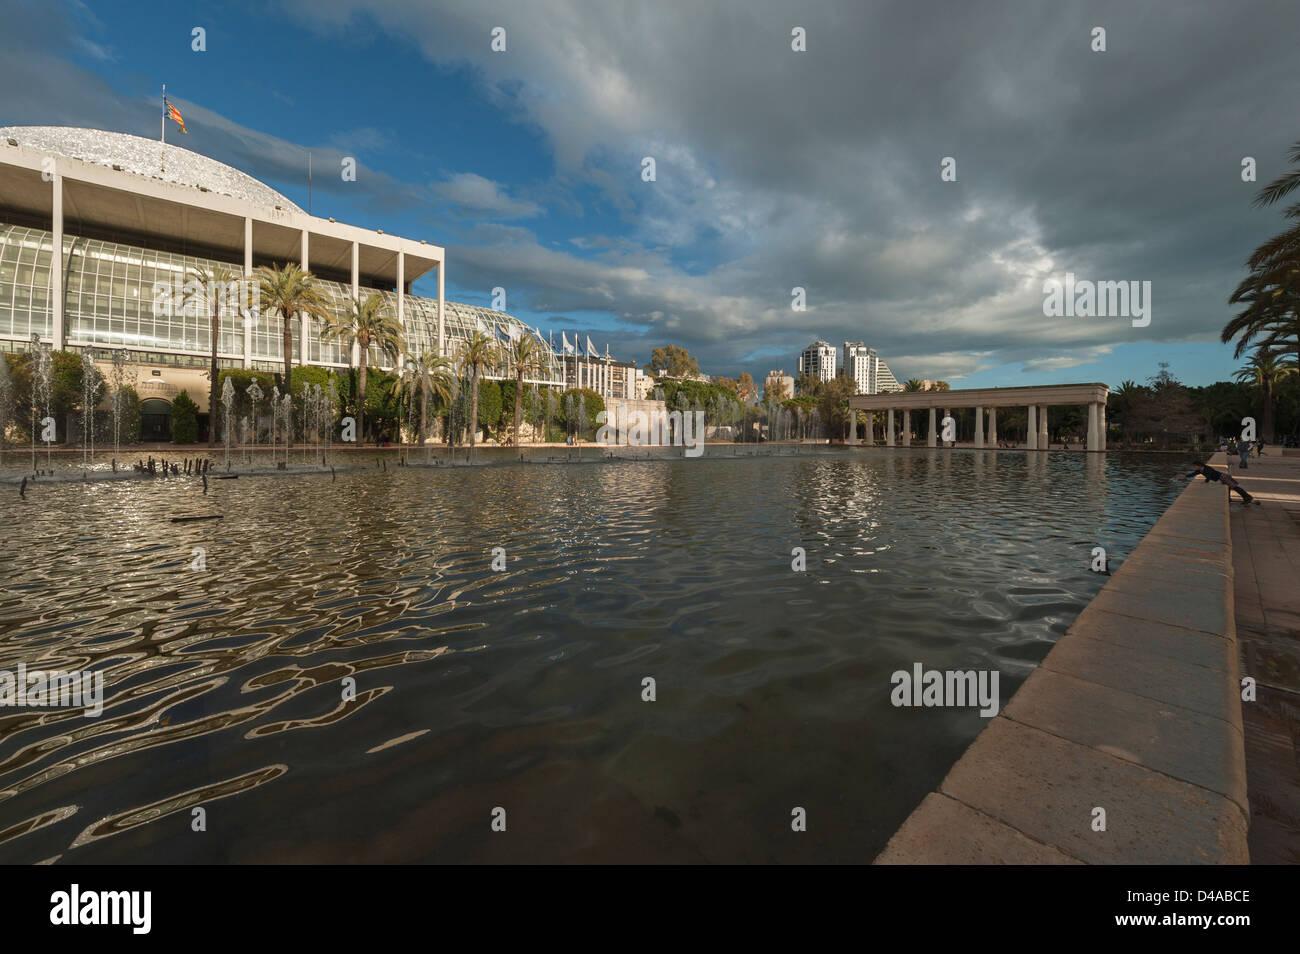 Palau de la música Valencia Imagen De Stock